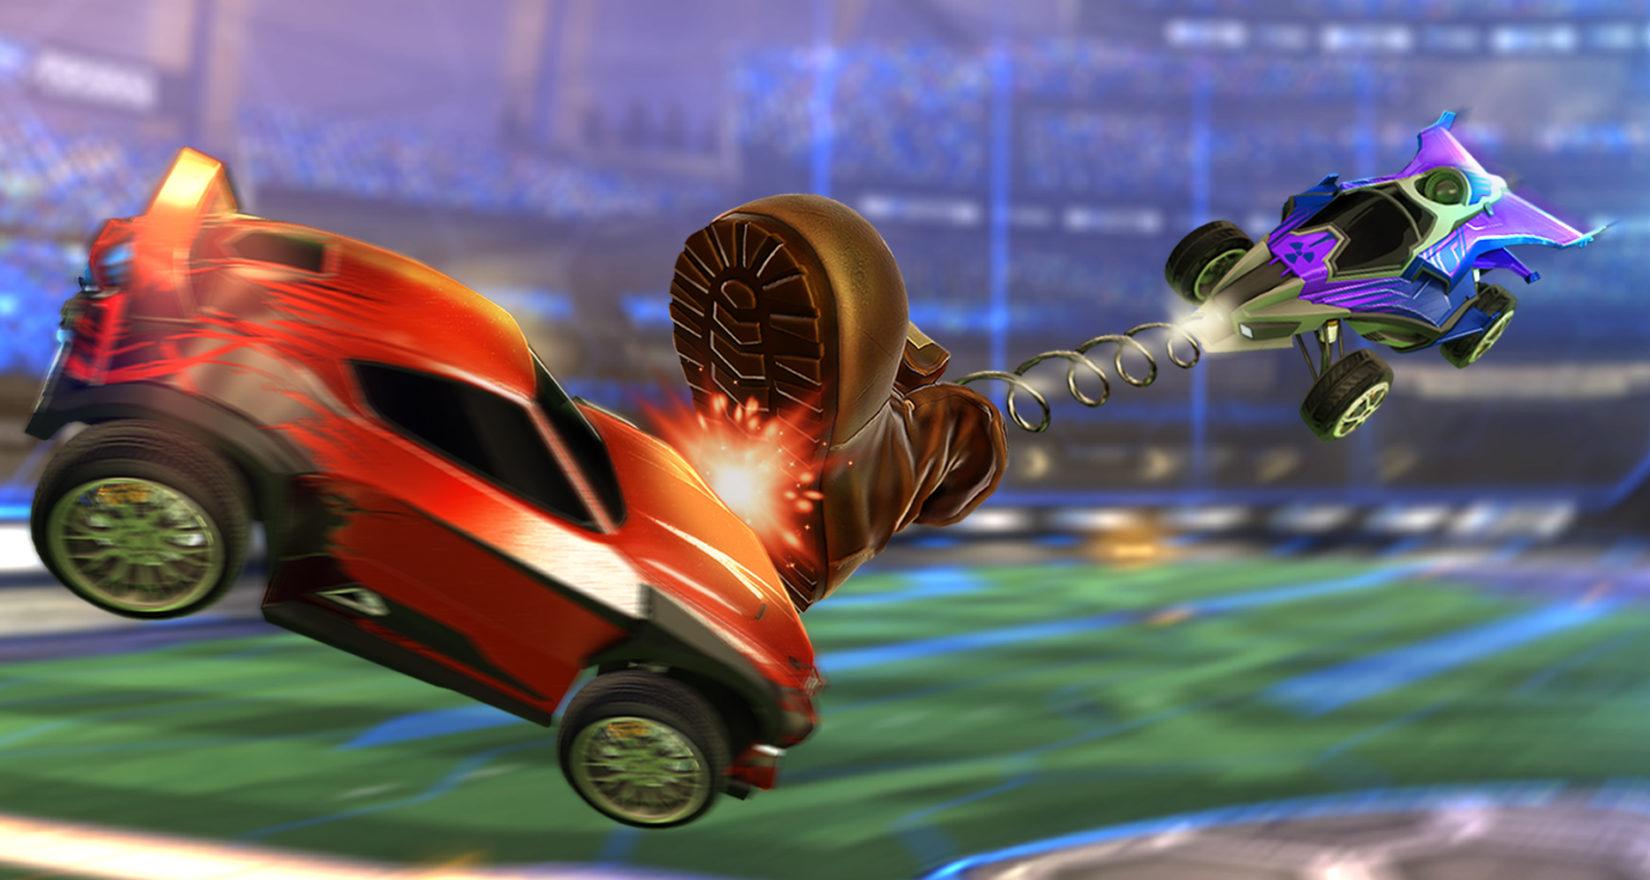 Rocket-League-pc-games.jpg